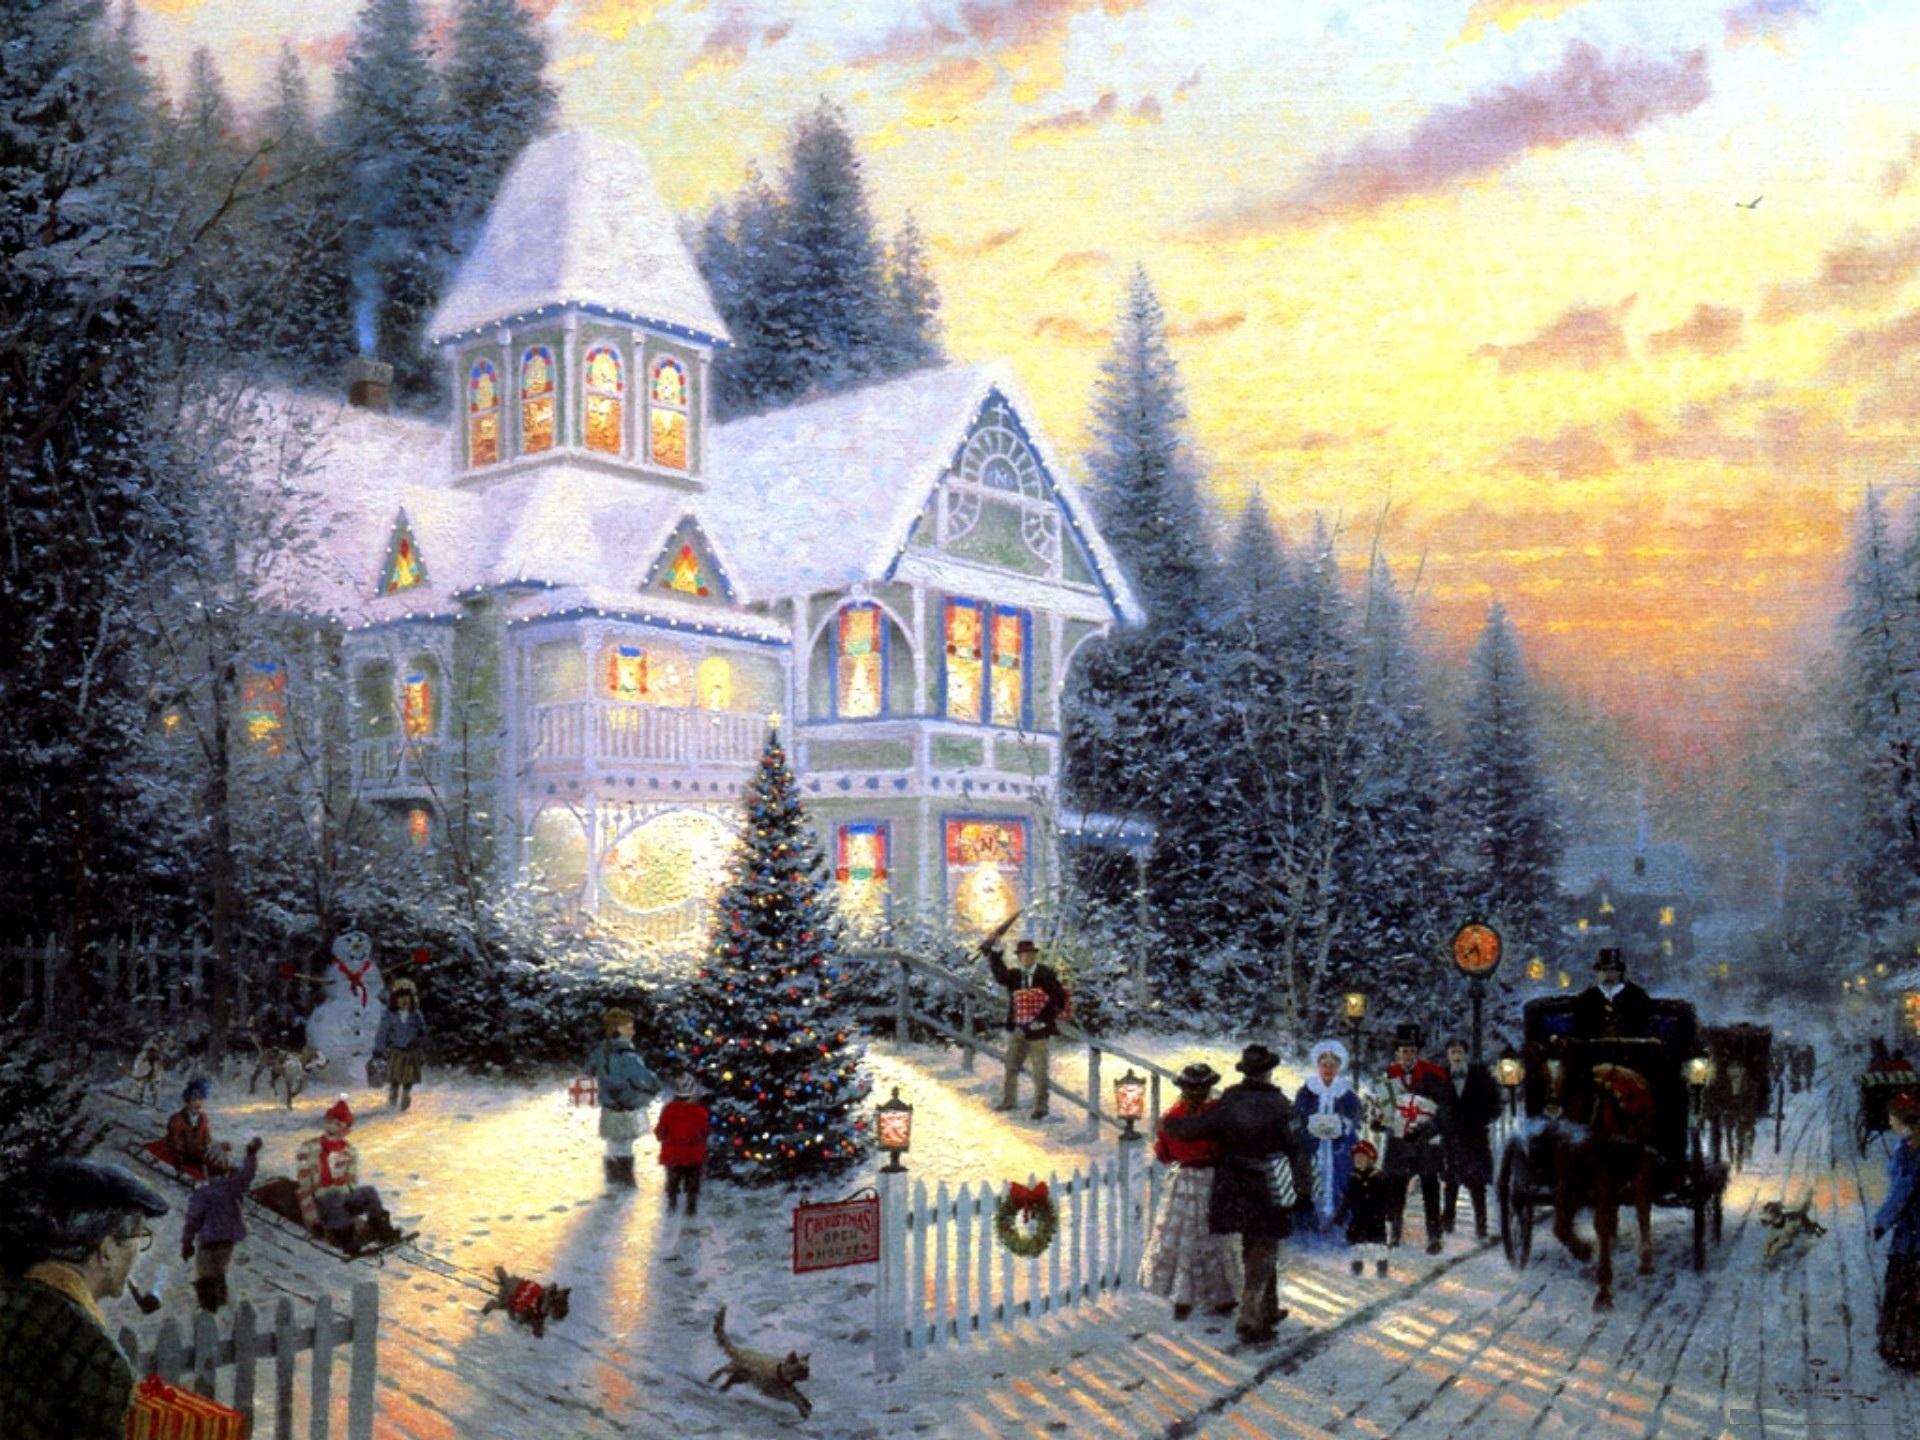 Wallpaper victorian christmas thomas kinkade cottage christmas tree 1920x1440